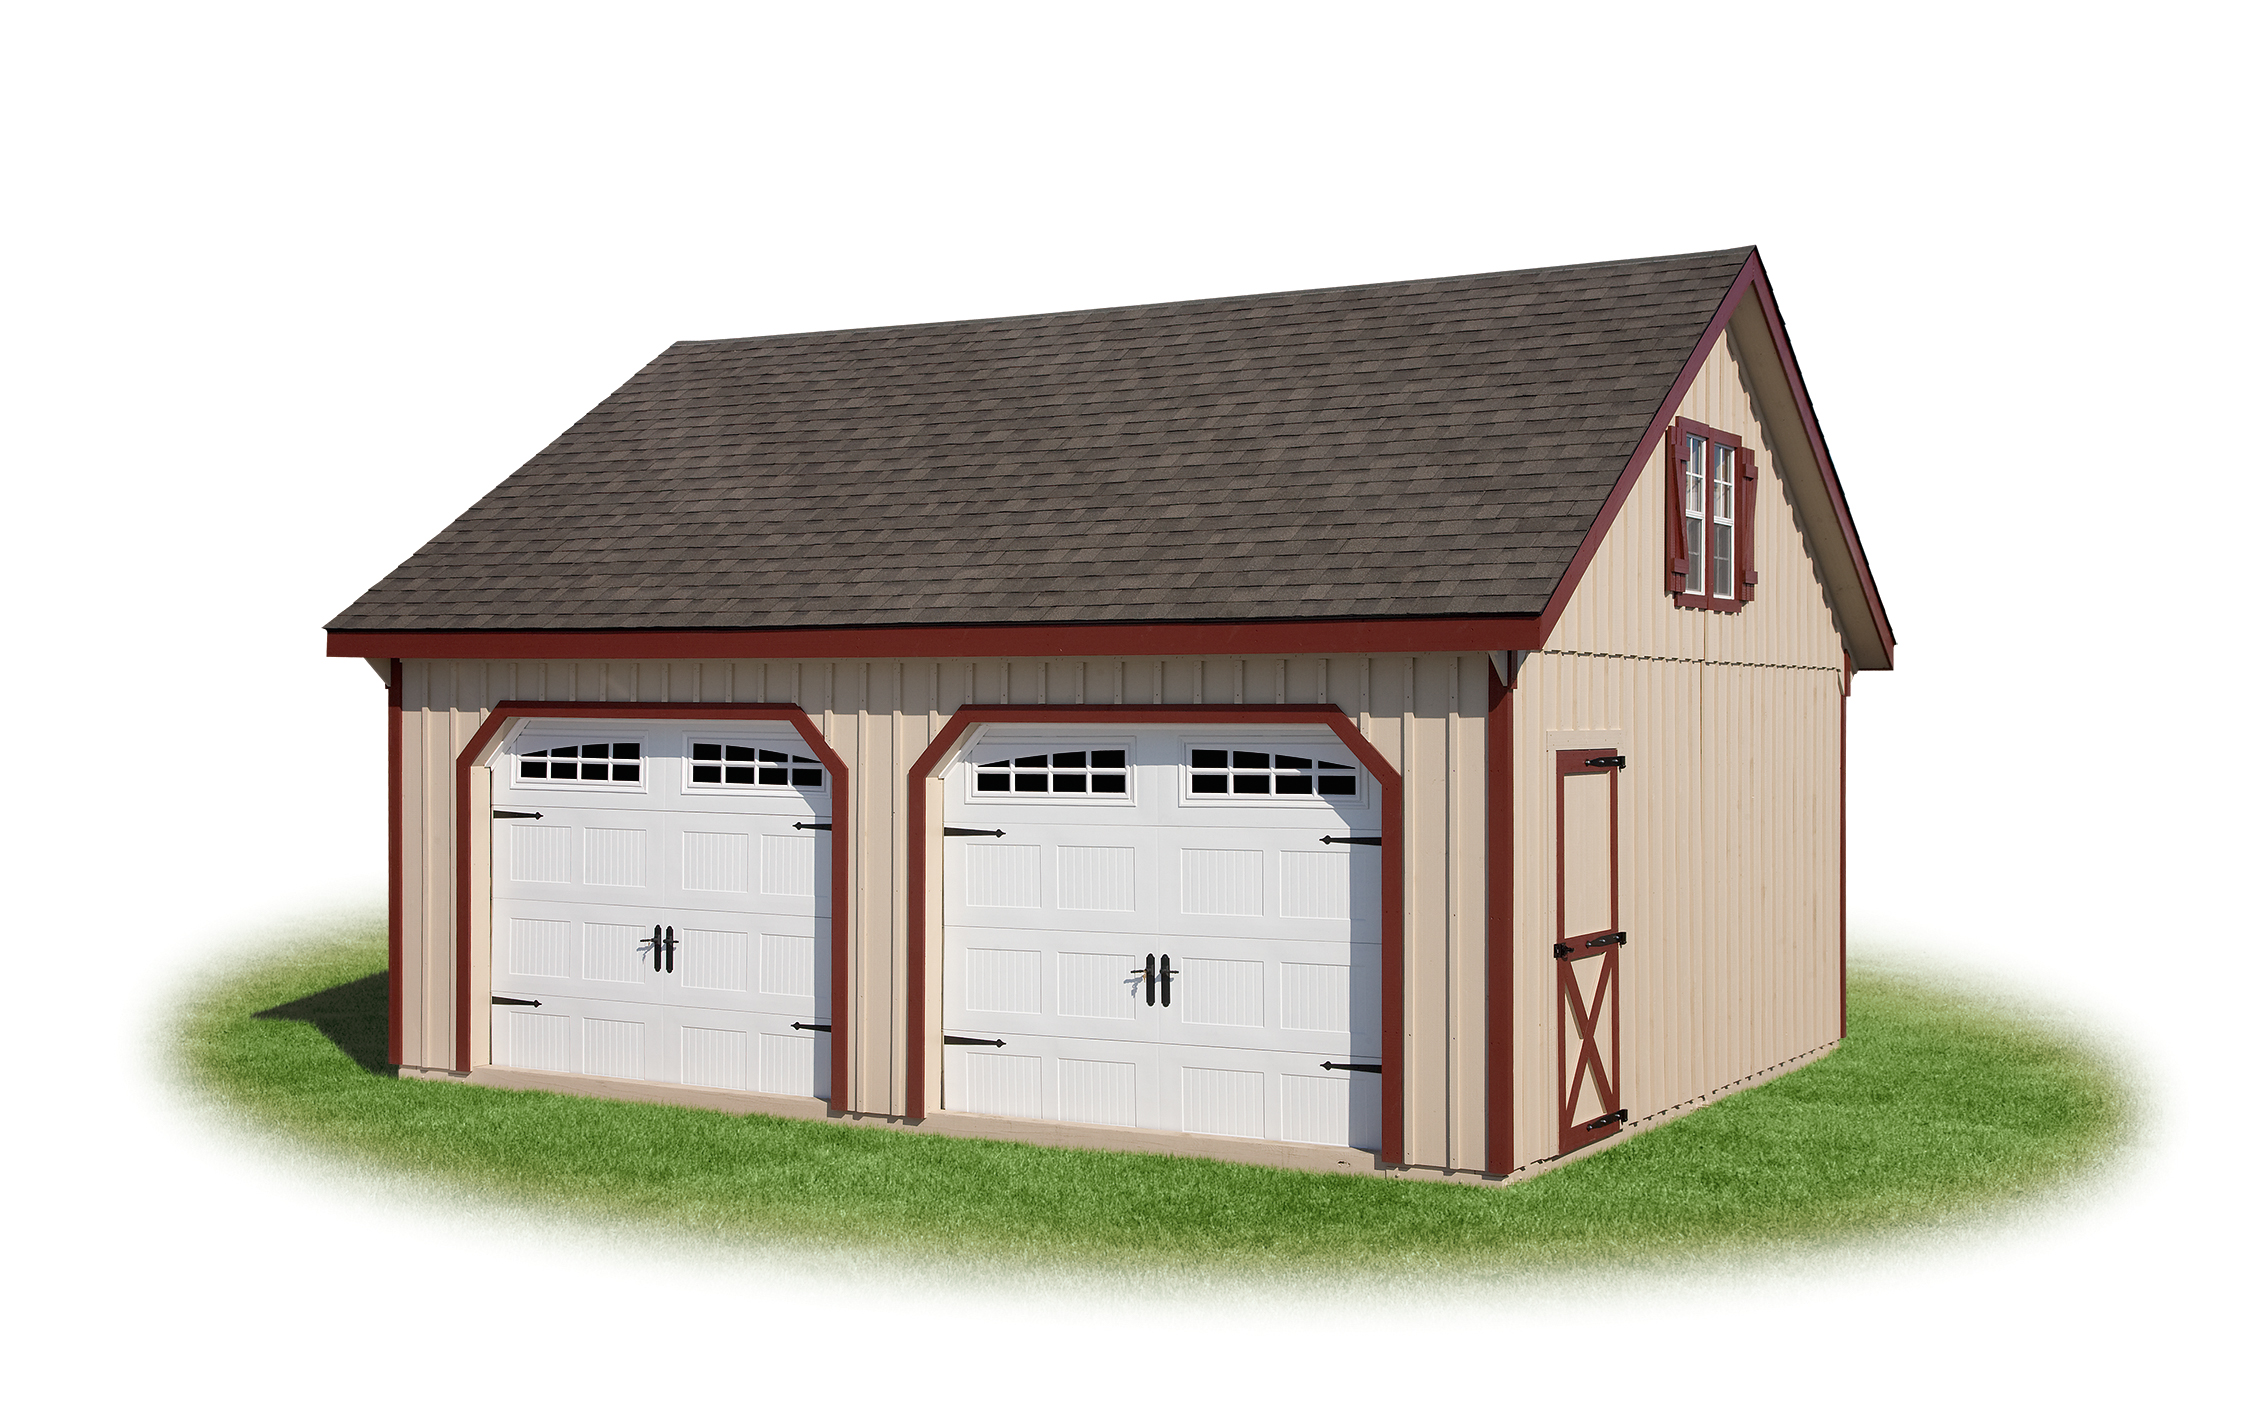 Modular garage full loft 2 for Prefabricated garage with loft